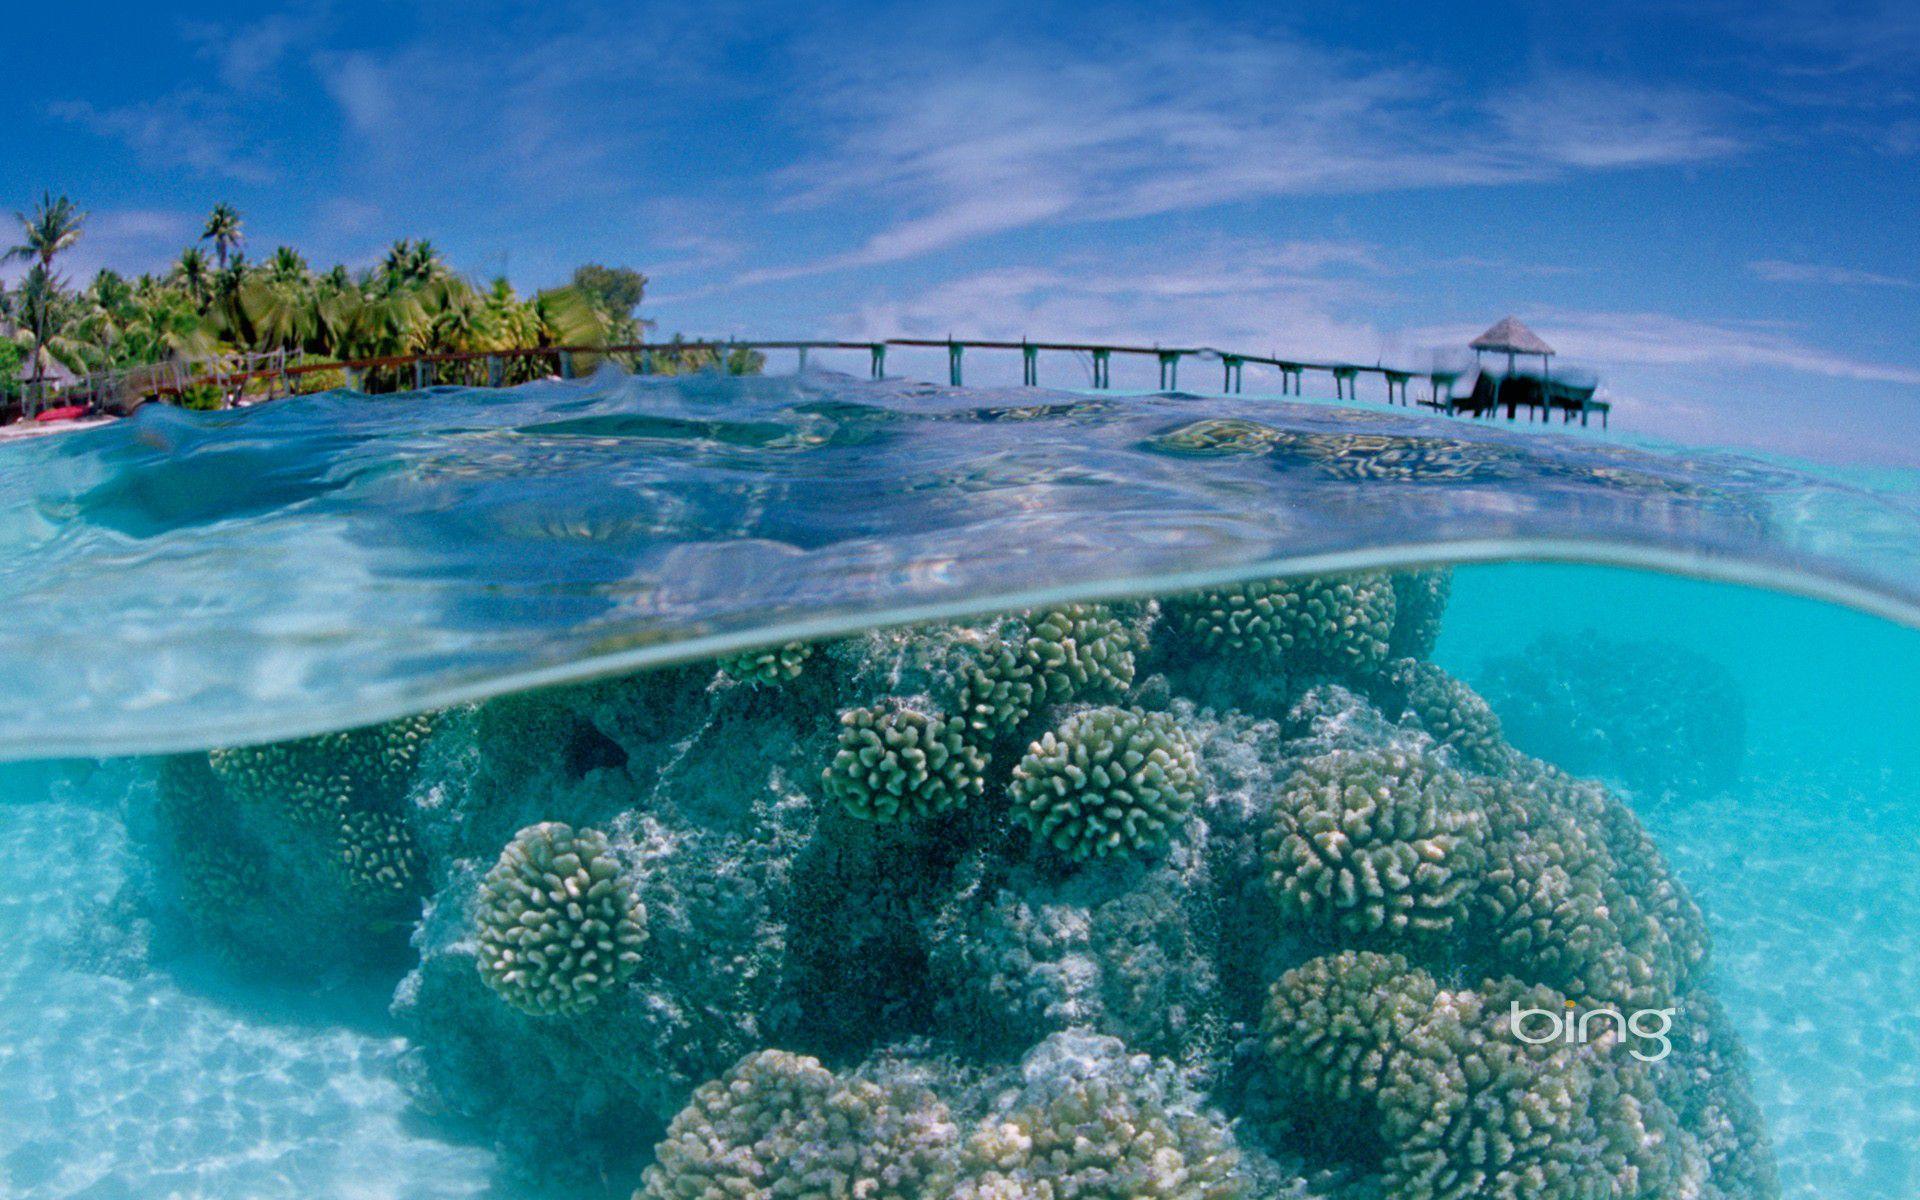 Fakarava Atoll Underwater 1920x1200 Awaa Con Imagenes